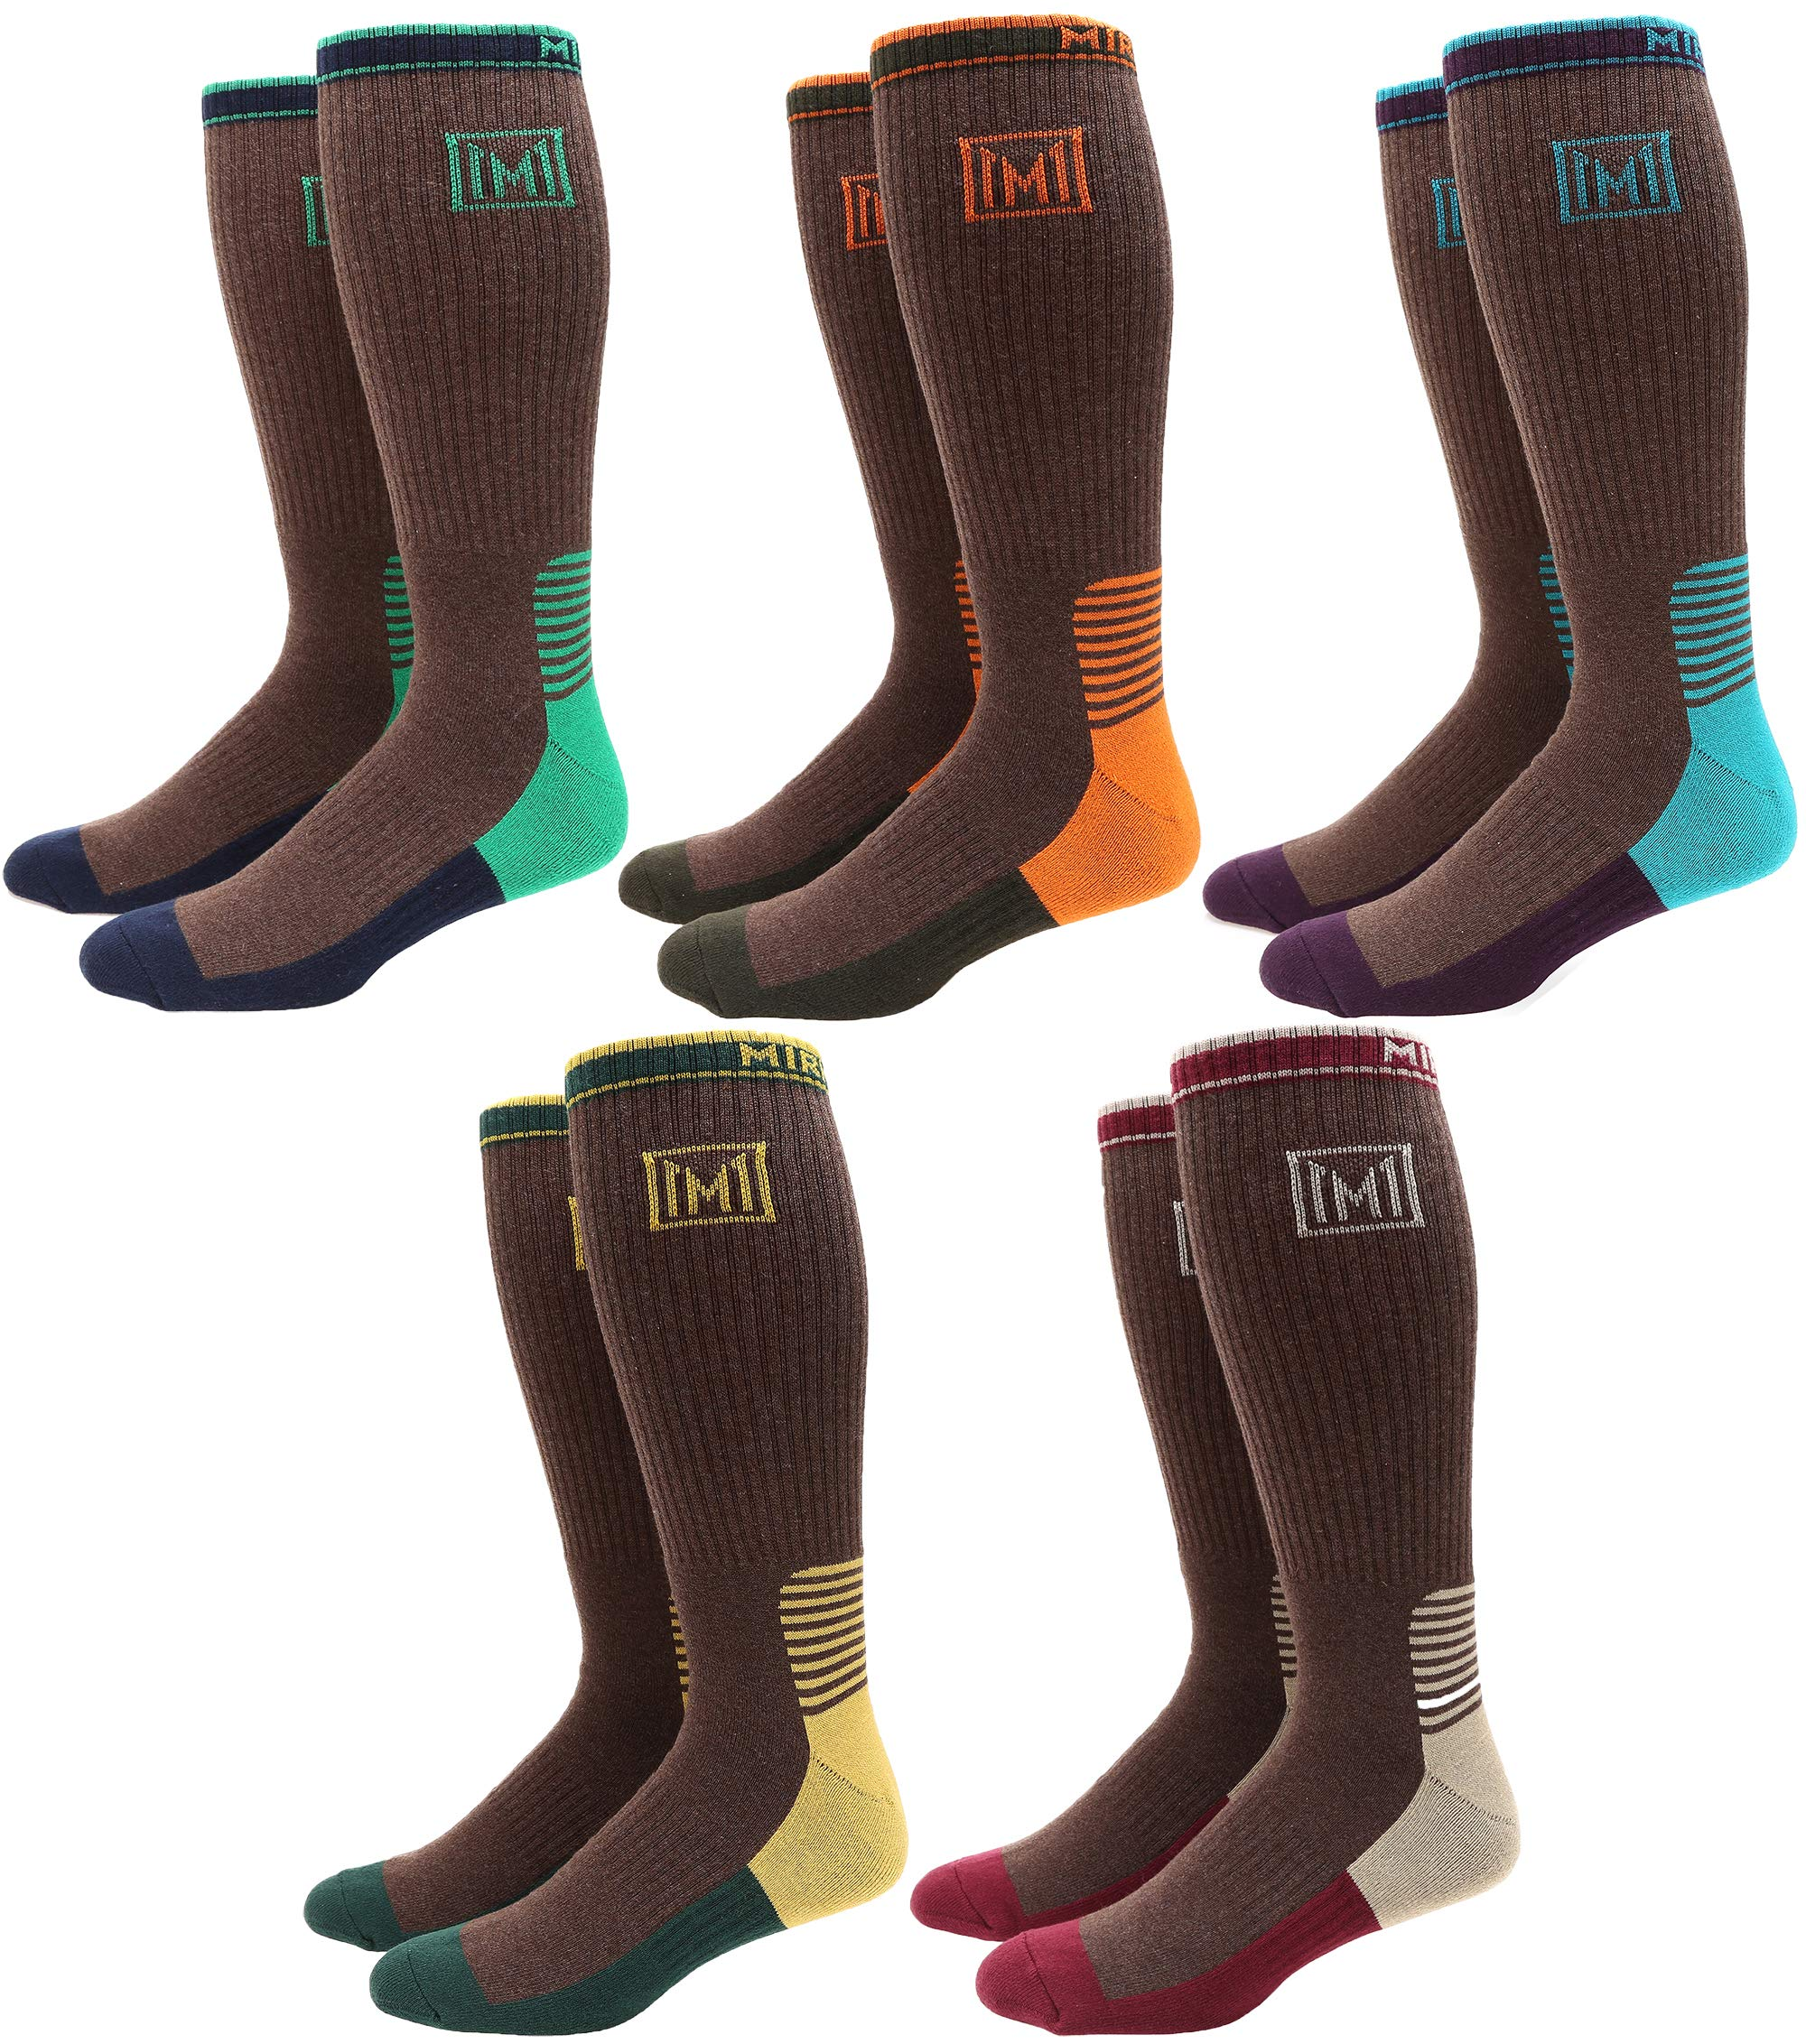 MIRMARU Men's 5 Pairs Multi Performance Over the Calf Outdoor Athletic Cushion Socks (5Pairs-Brown) by MIRMARU